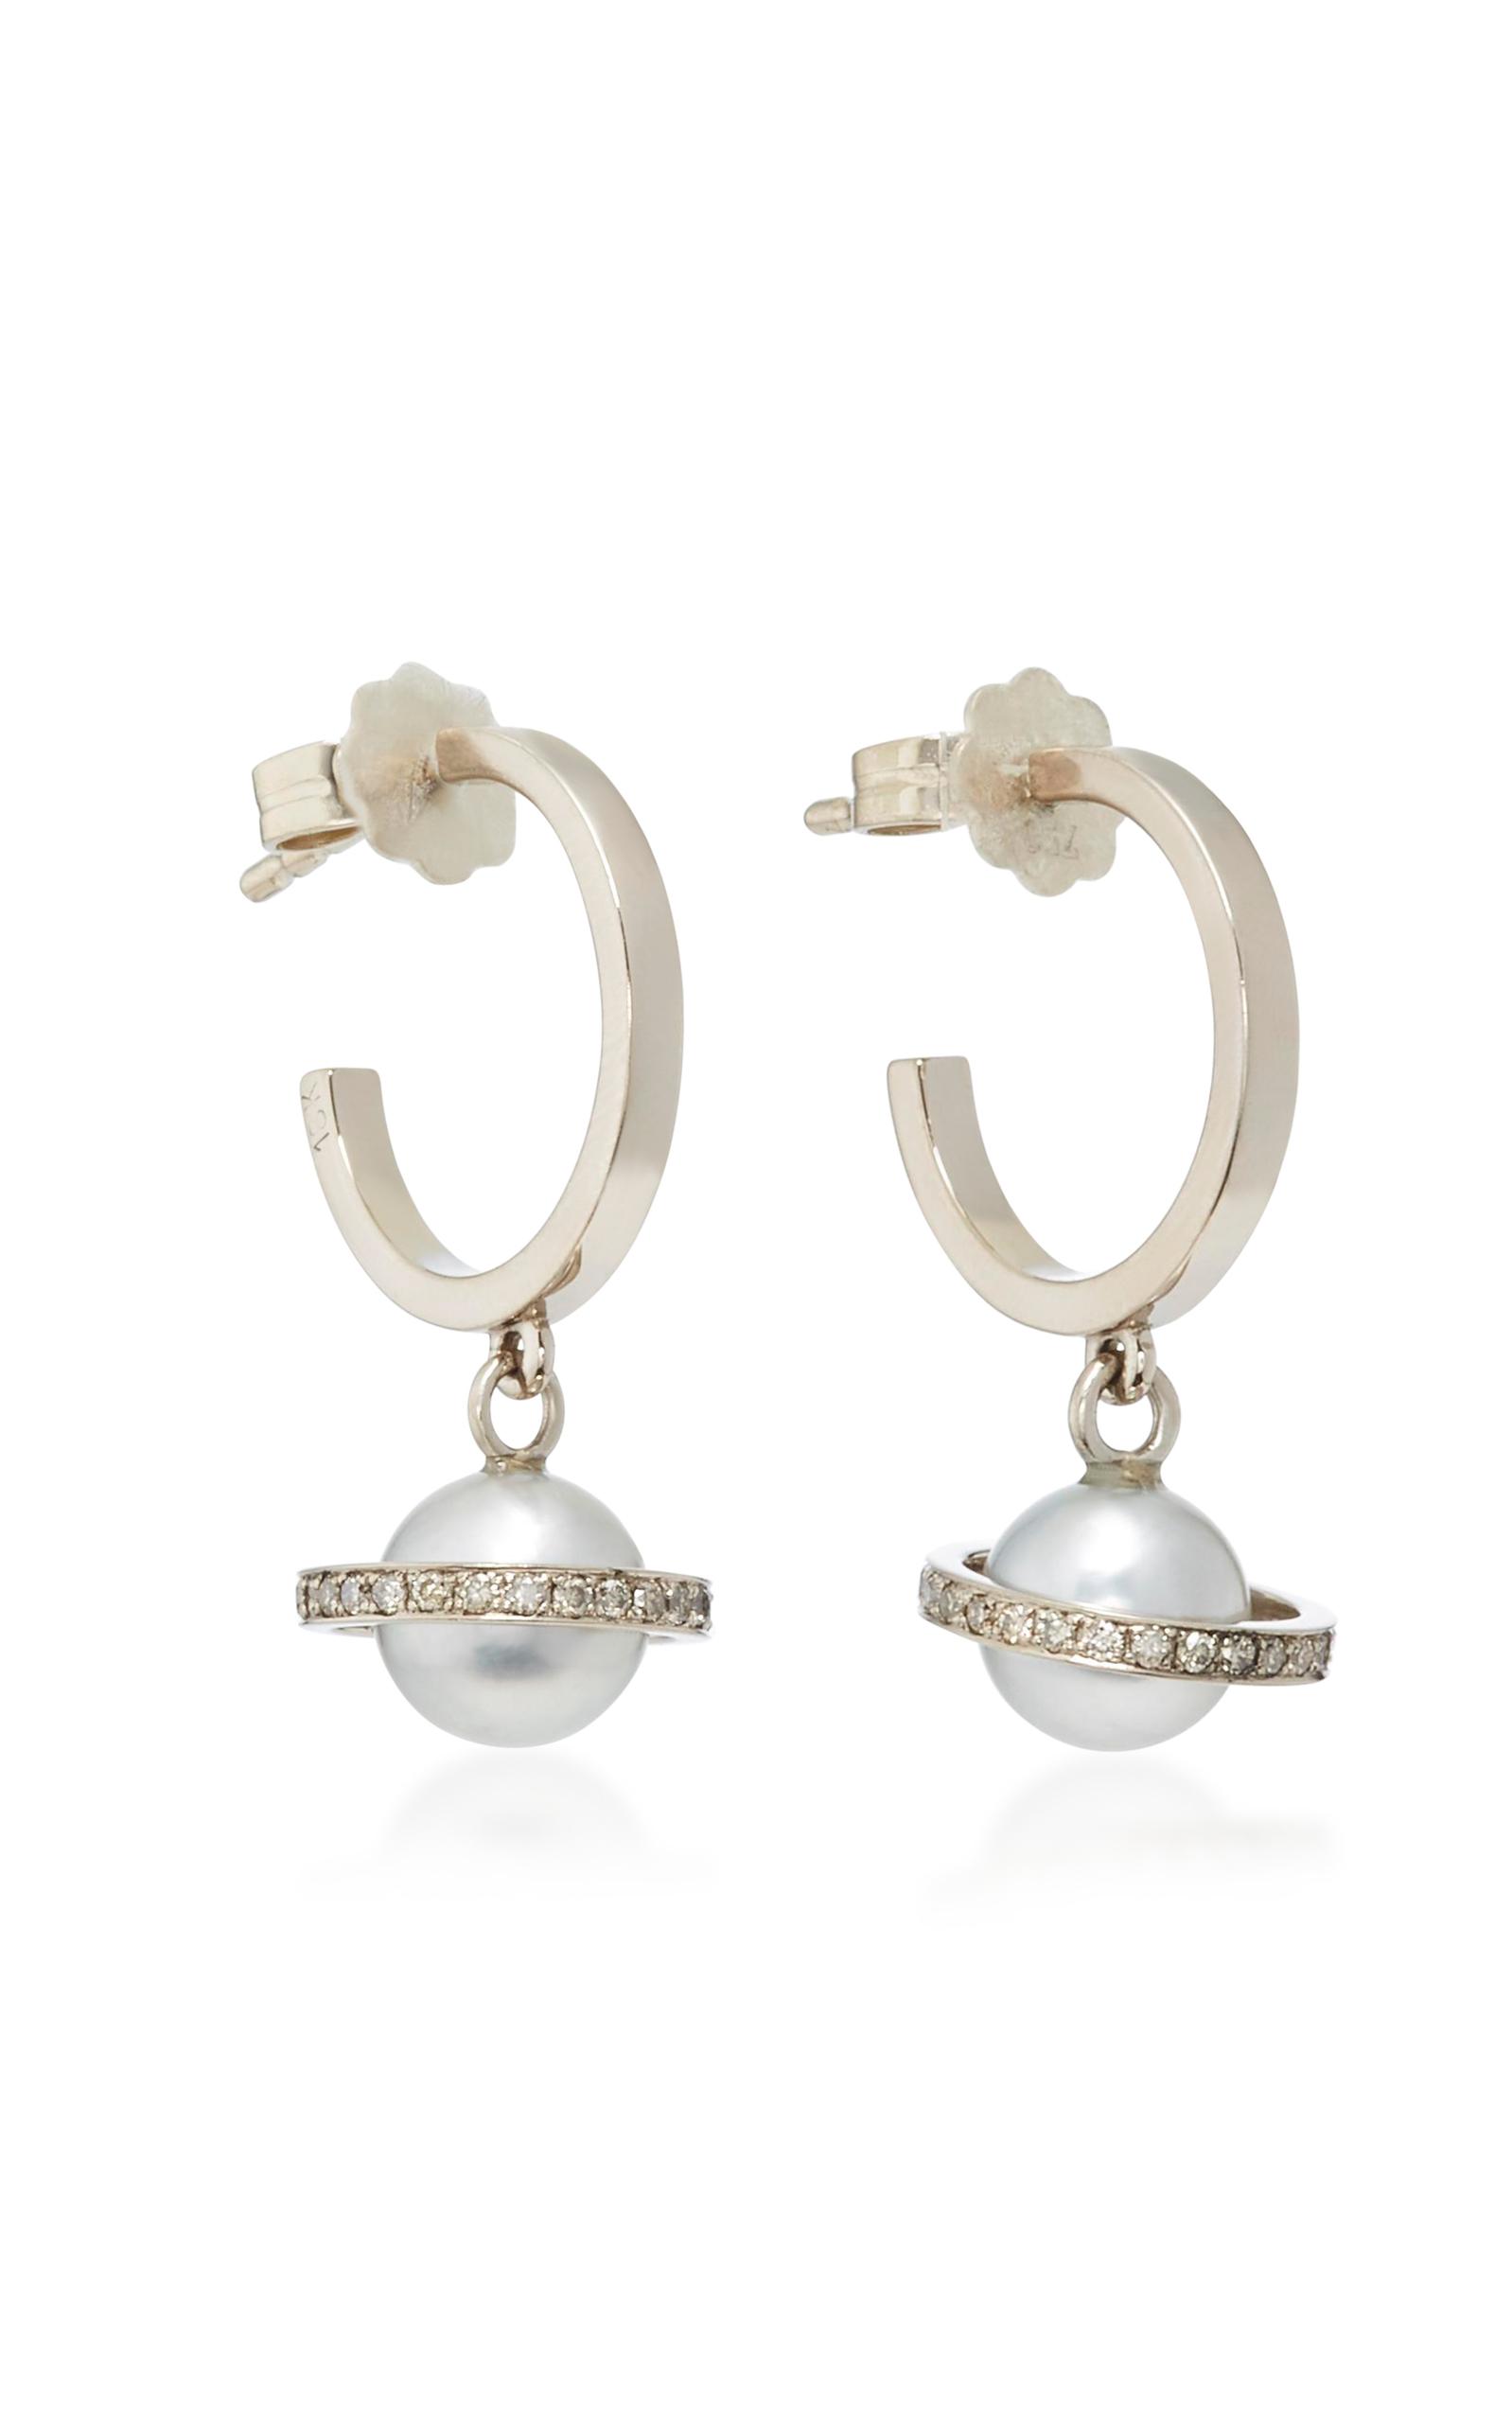 ALINA ABEGG Mirco Saturn White Gold Diamond And Pearl Hoops